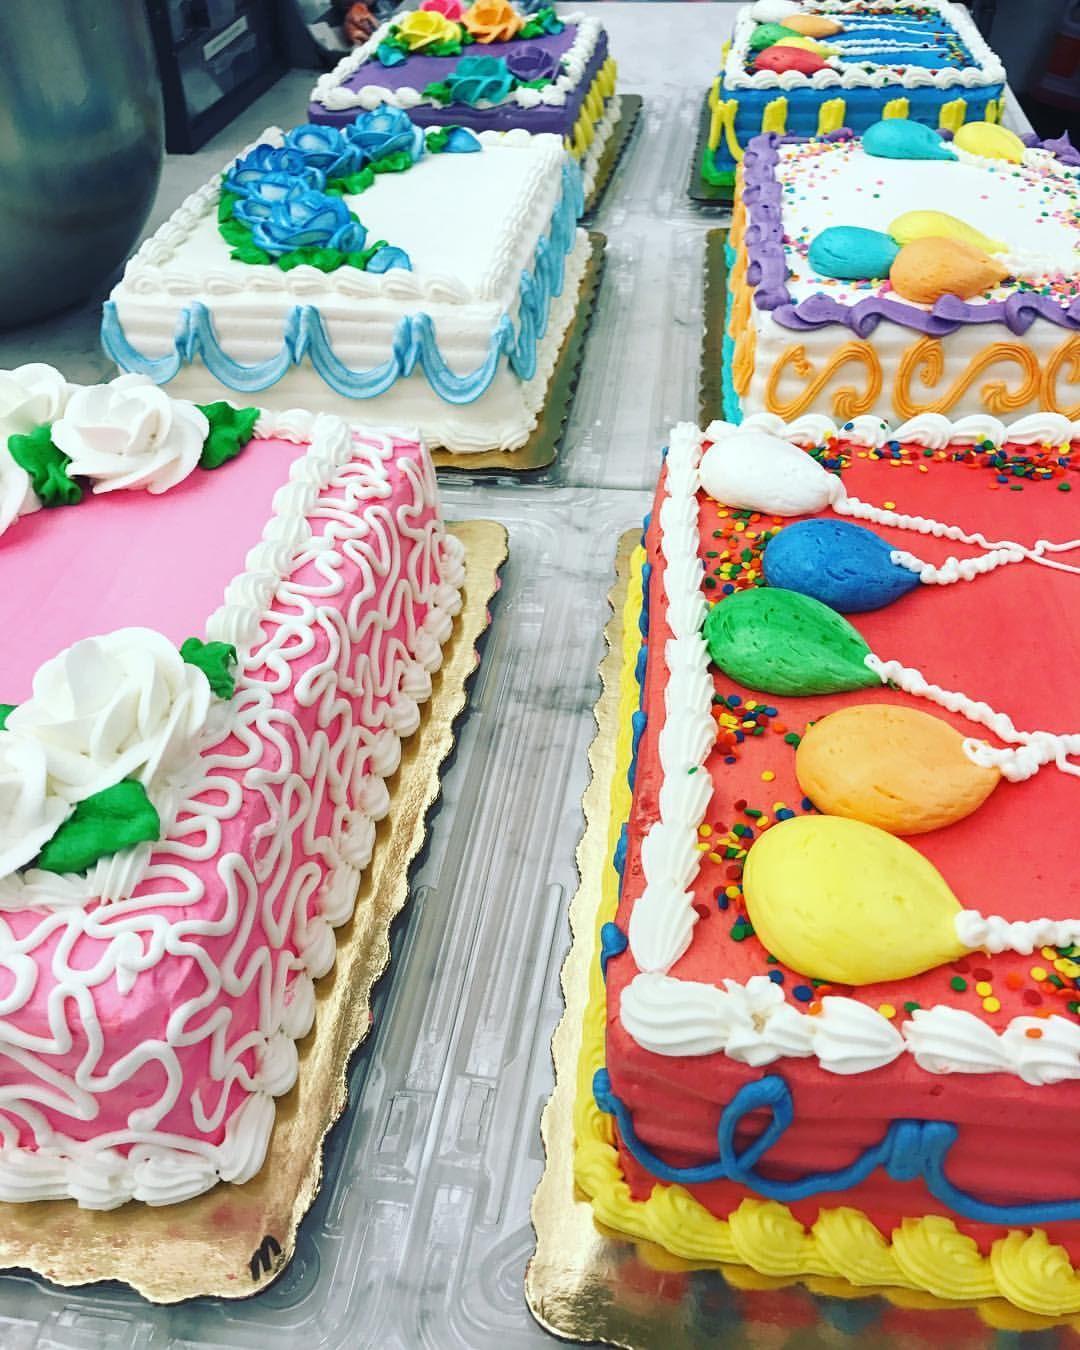 print picture on cake publix